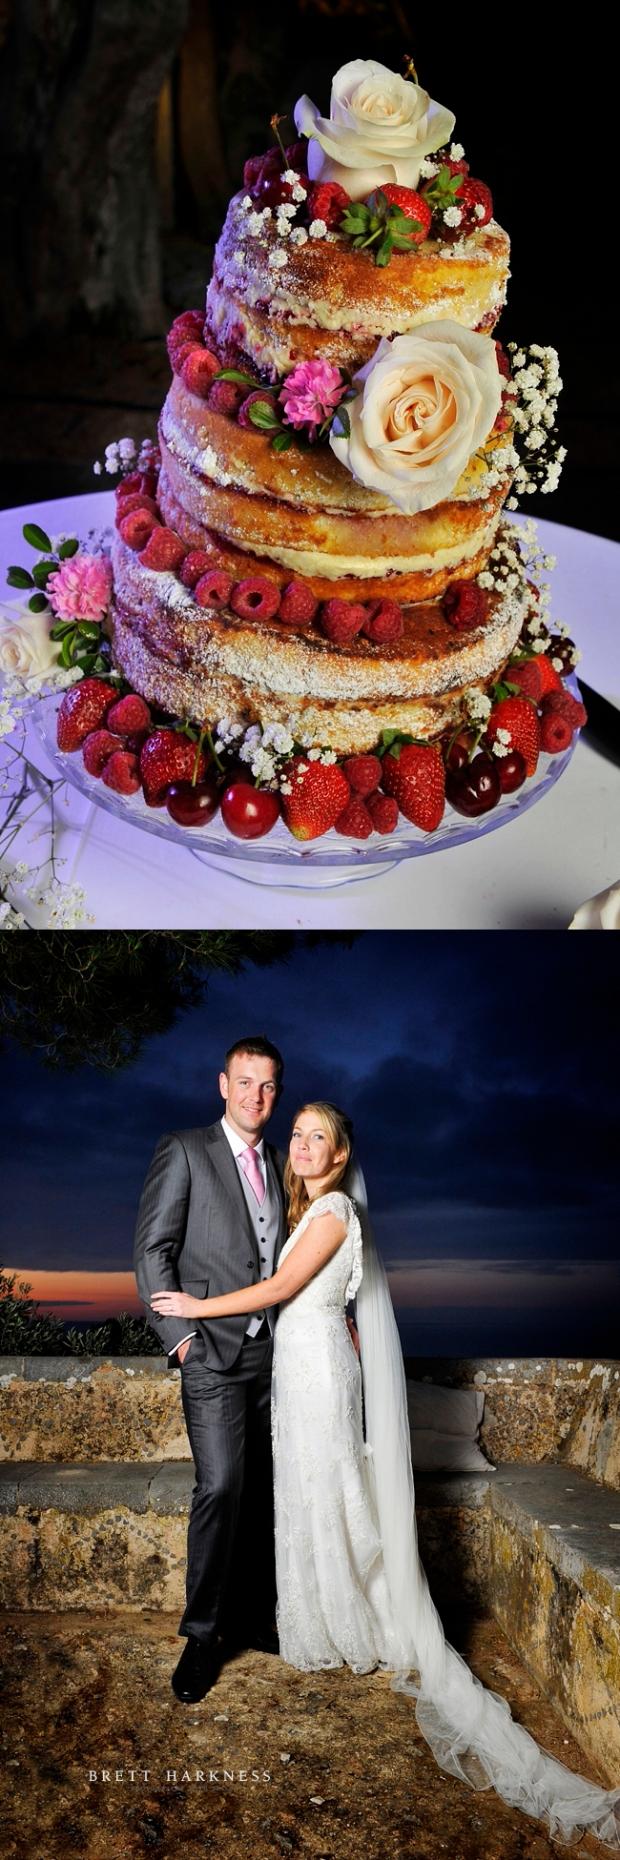 brett_harkness_majorca_wedding_photography_mallorca_weddign_photography_0045 (1)